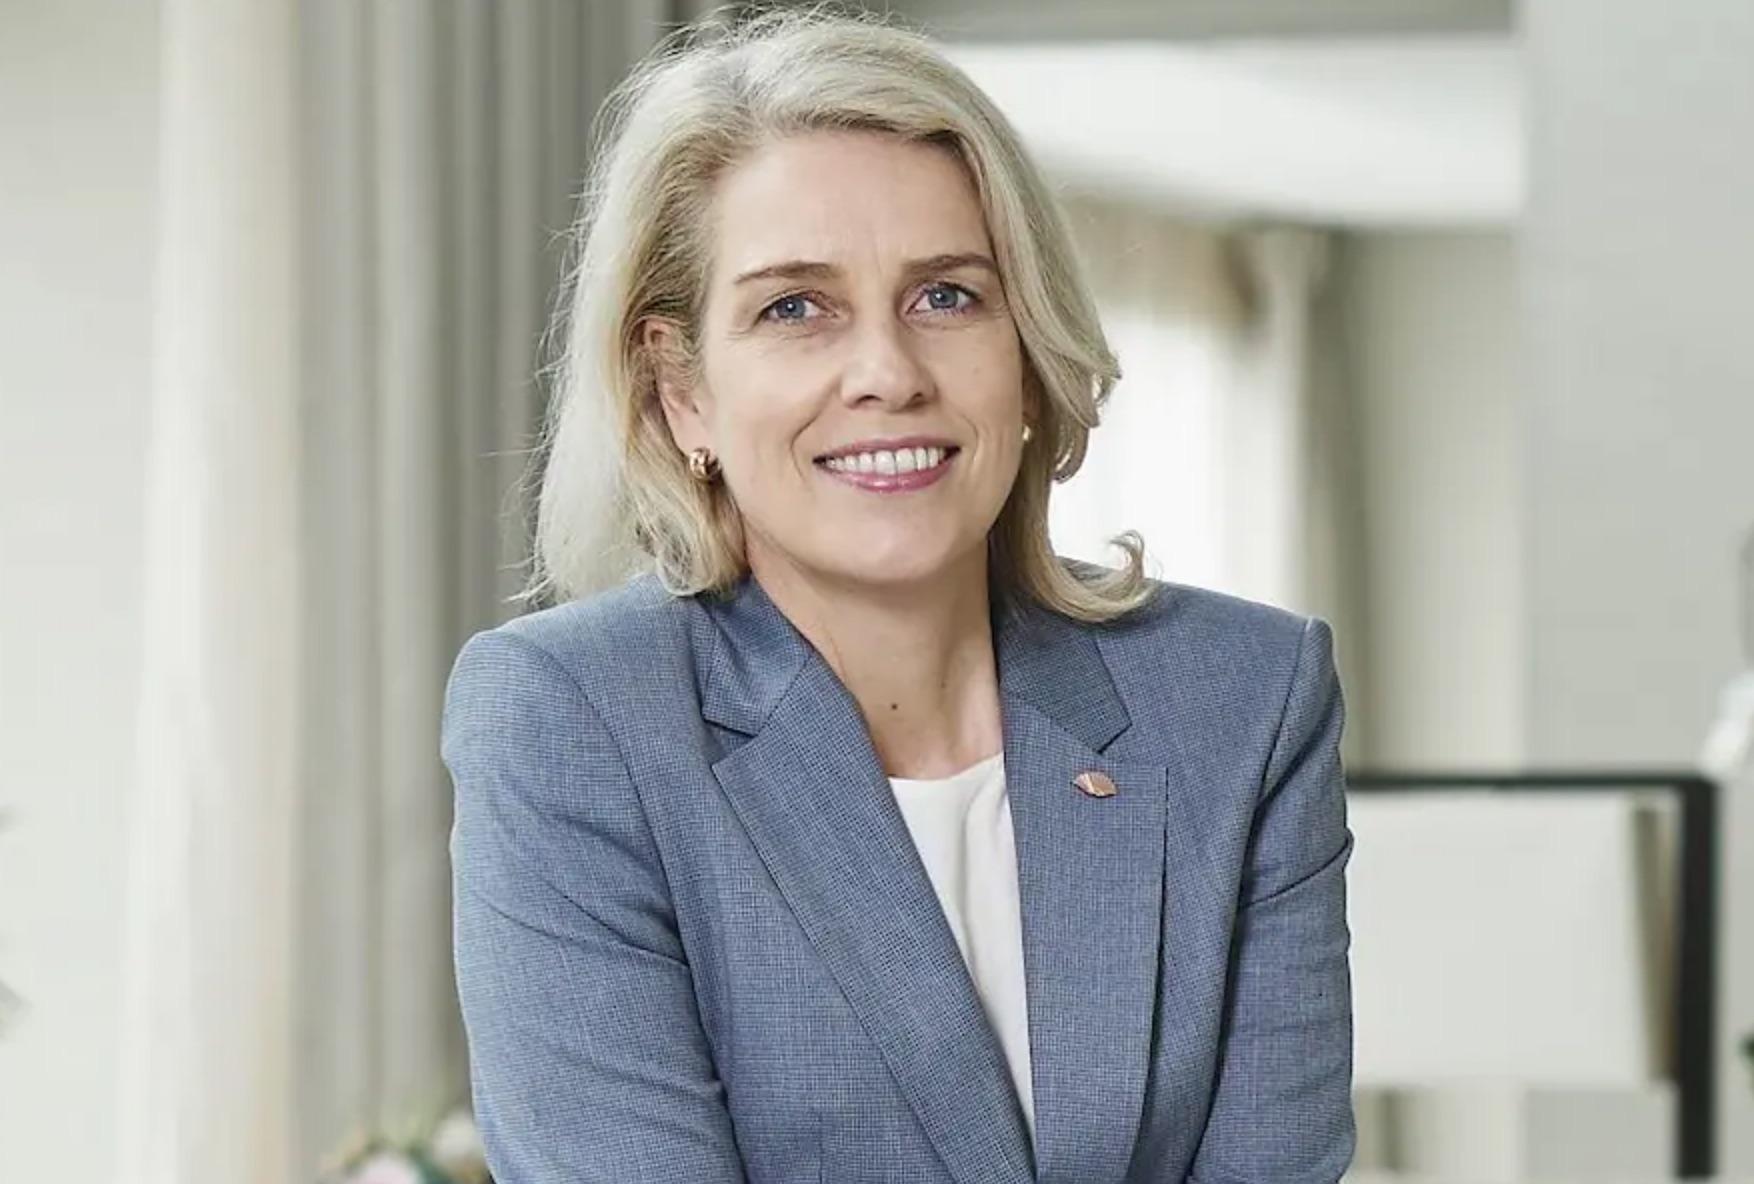 Geraldine Dobey, General Manager Mandarin Oriental Paris & Area Vice President